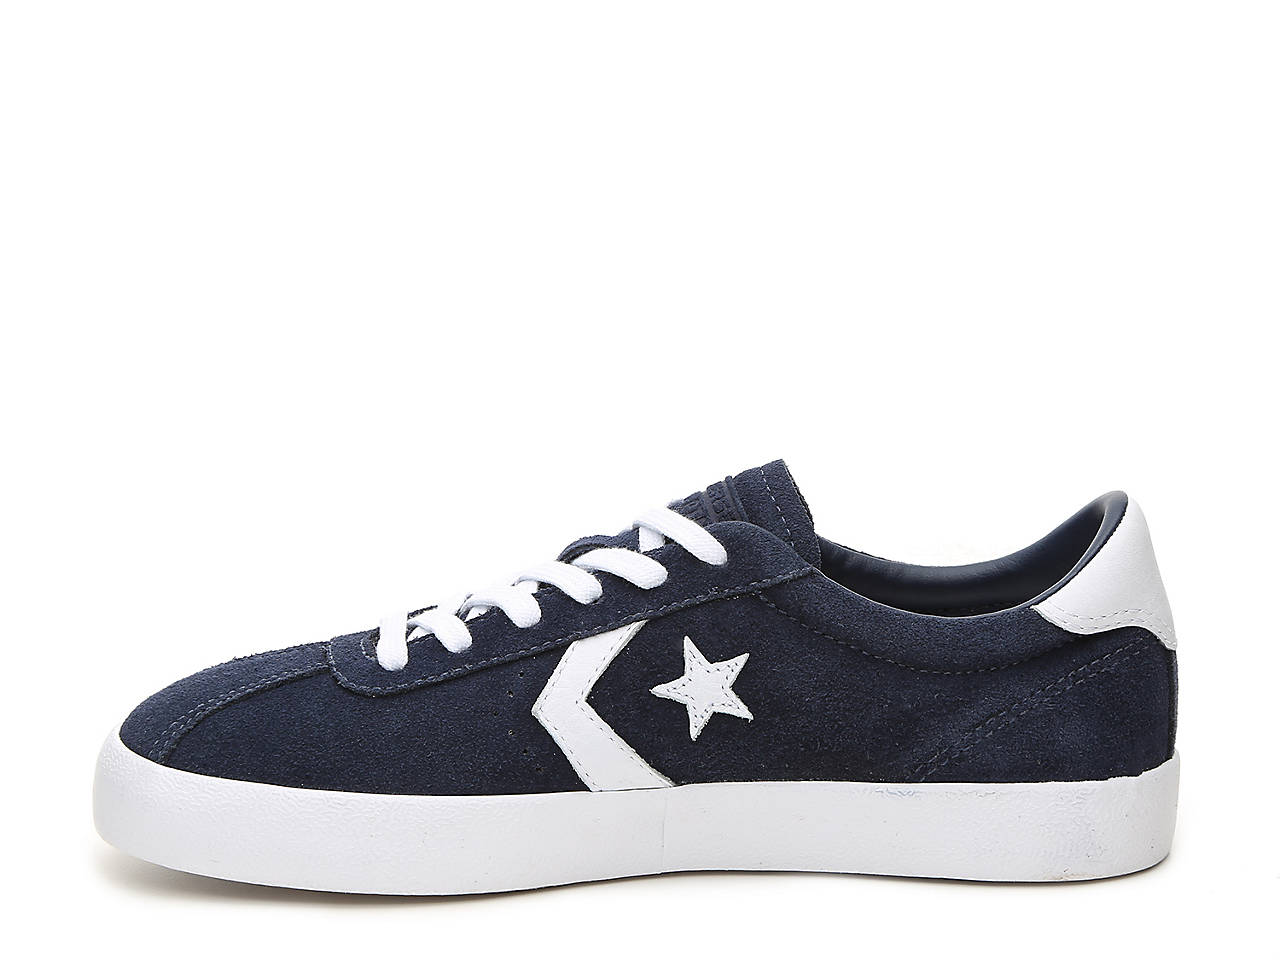 ed6719a43d06eb Converse Chuck Taylor All Star Breakpoint Sneaker - Women s Women s ...